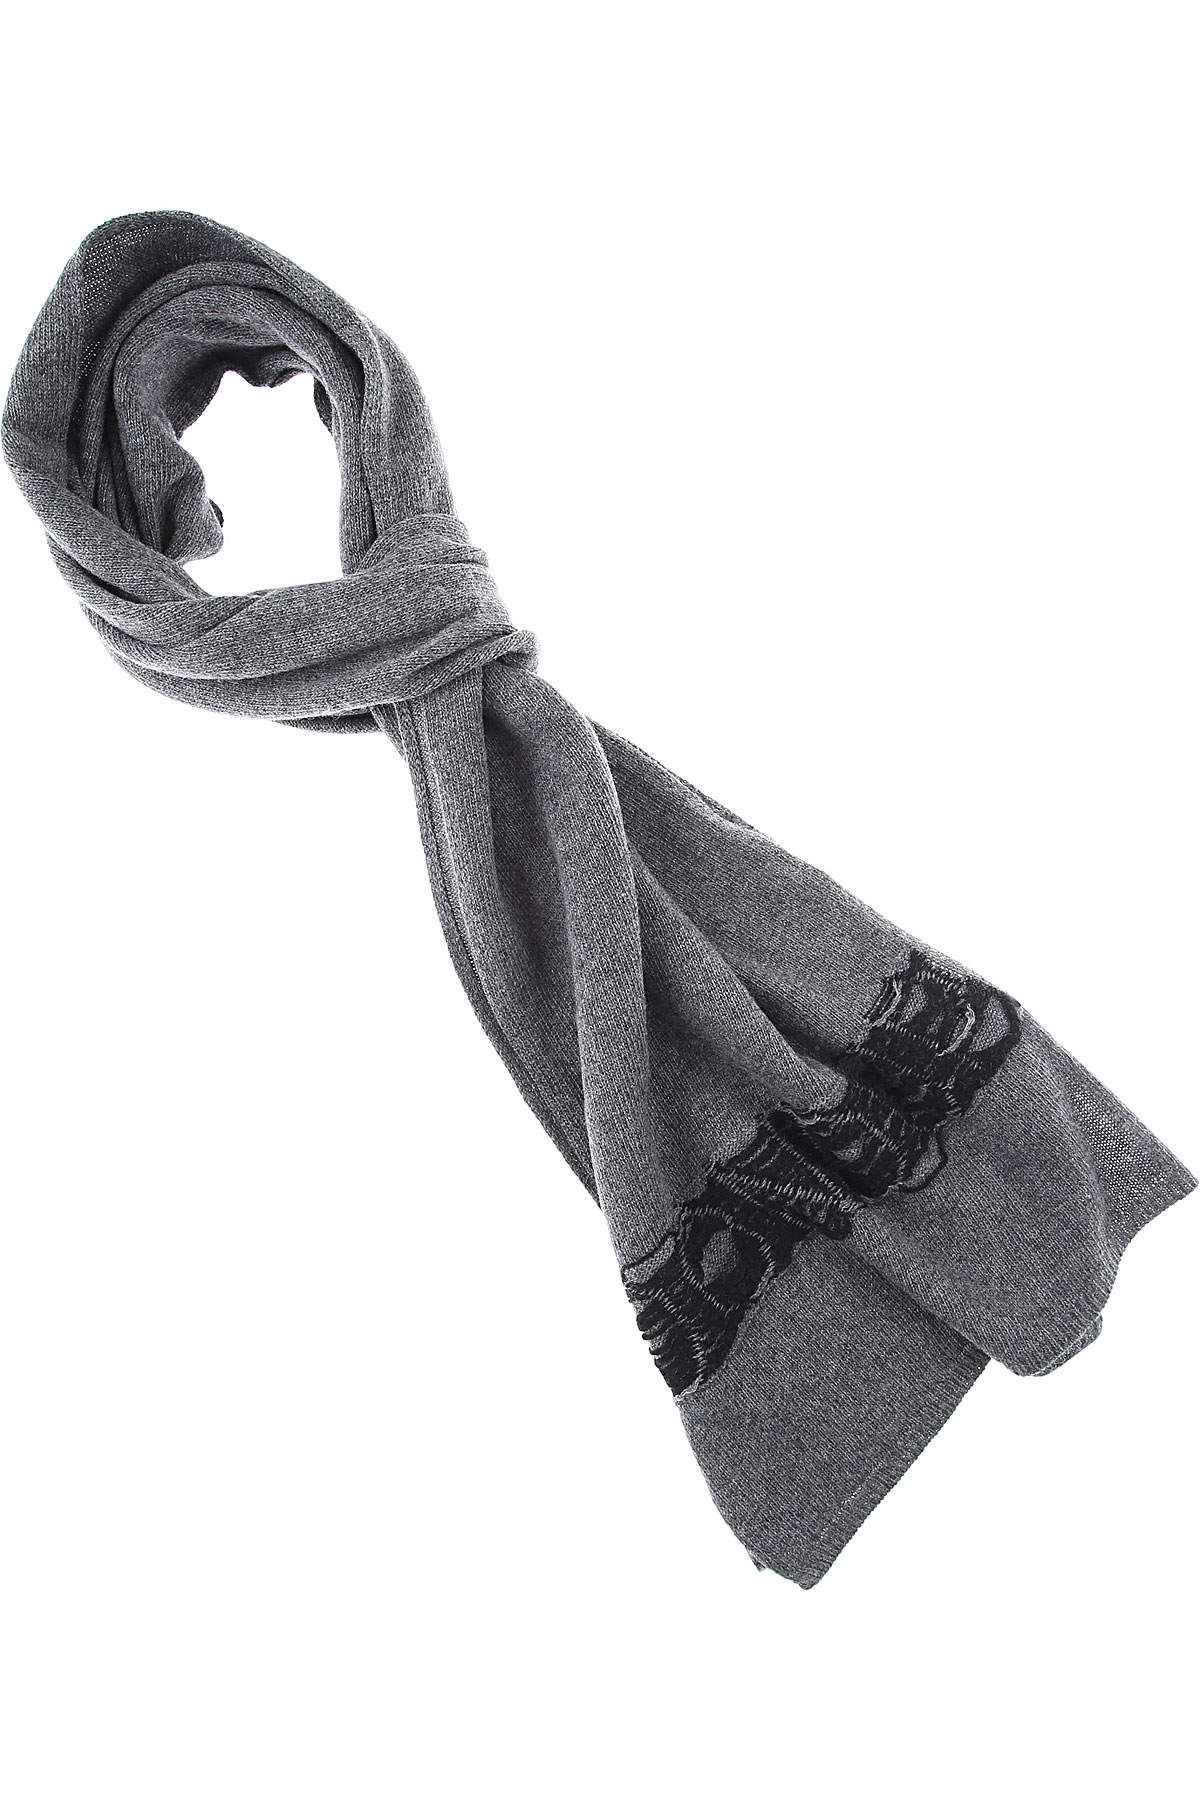 Dondup Scarf for Men, Anthracite Grey, Wool, 2019